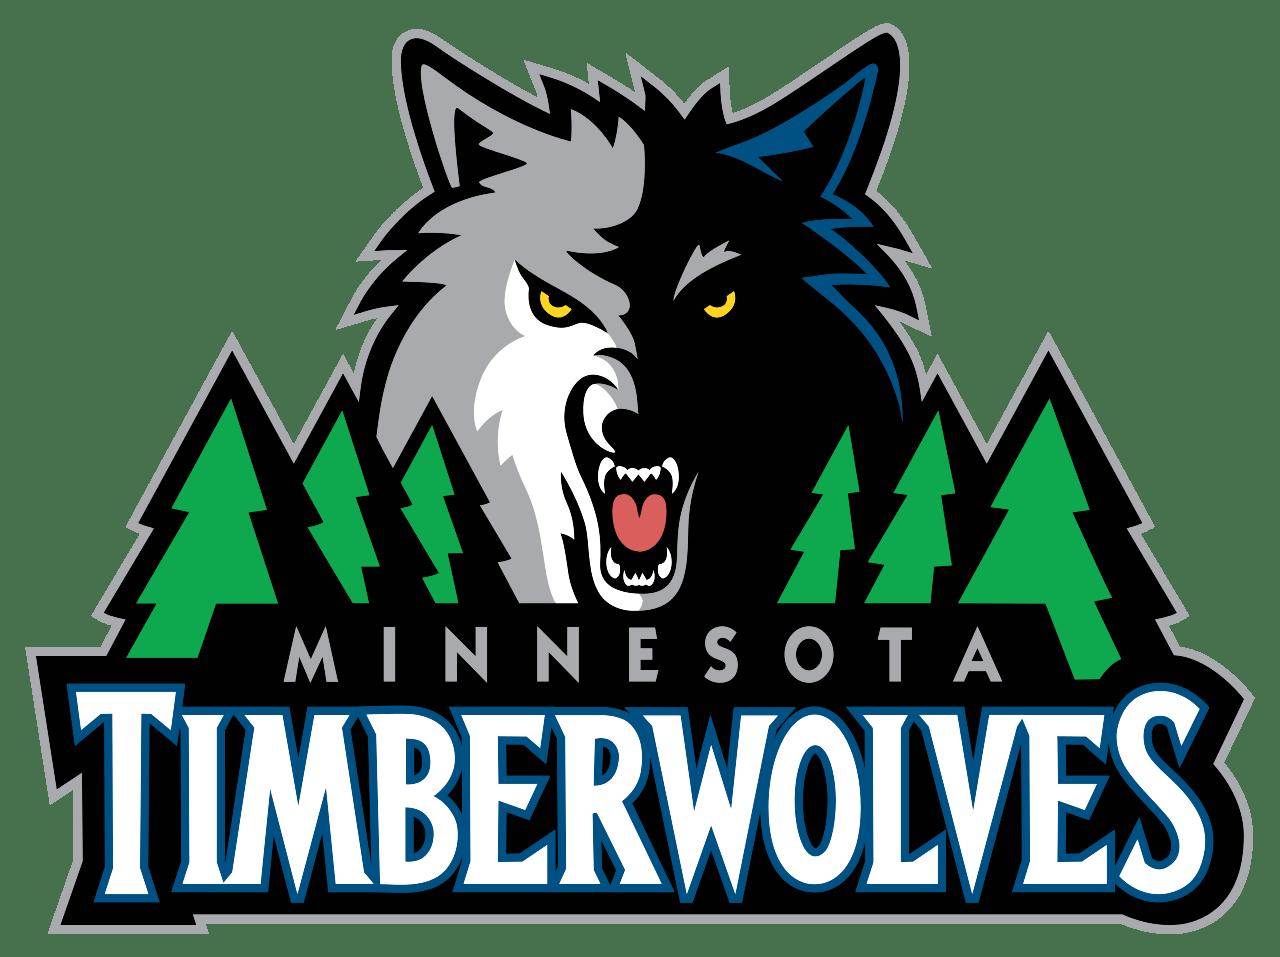 Minnesota Timberwolves Logo Minnesota Timberwolves Equipo De Basquetbol Equipos De Baloncesto